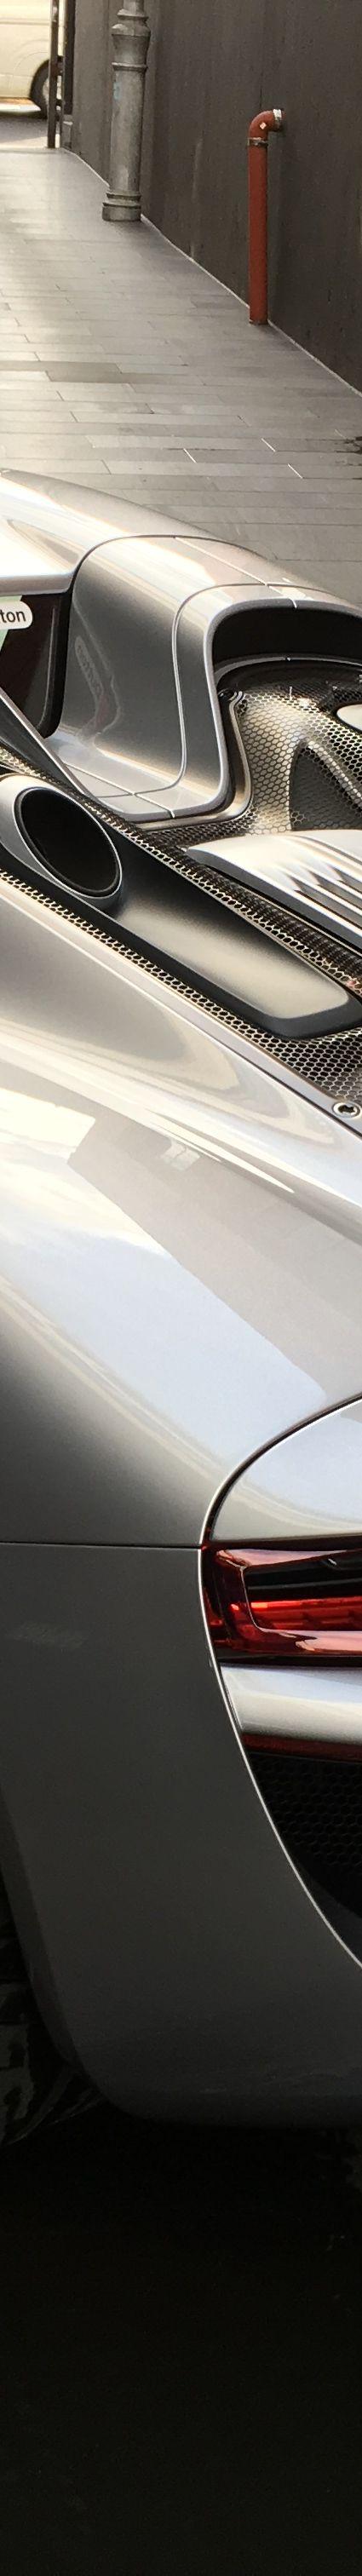 2015 porsche 918 spyder convertible hybrid hypercar for sale at dutton garage melbourne australia classic prestige luxury exotic car dealership